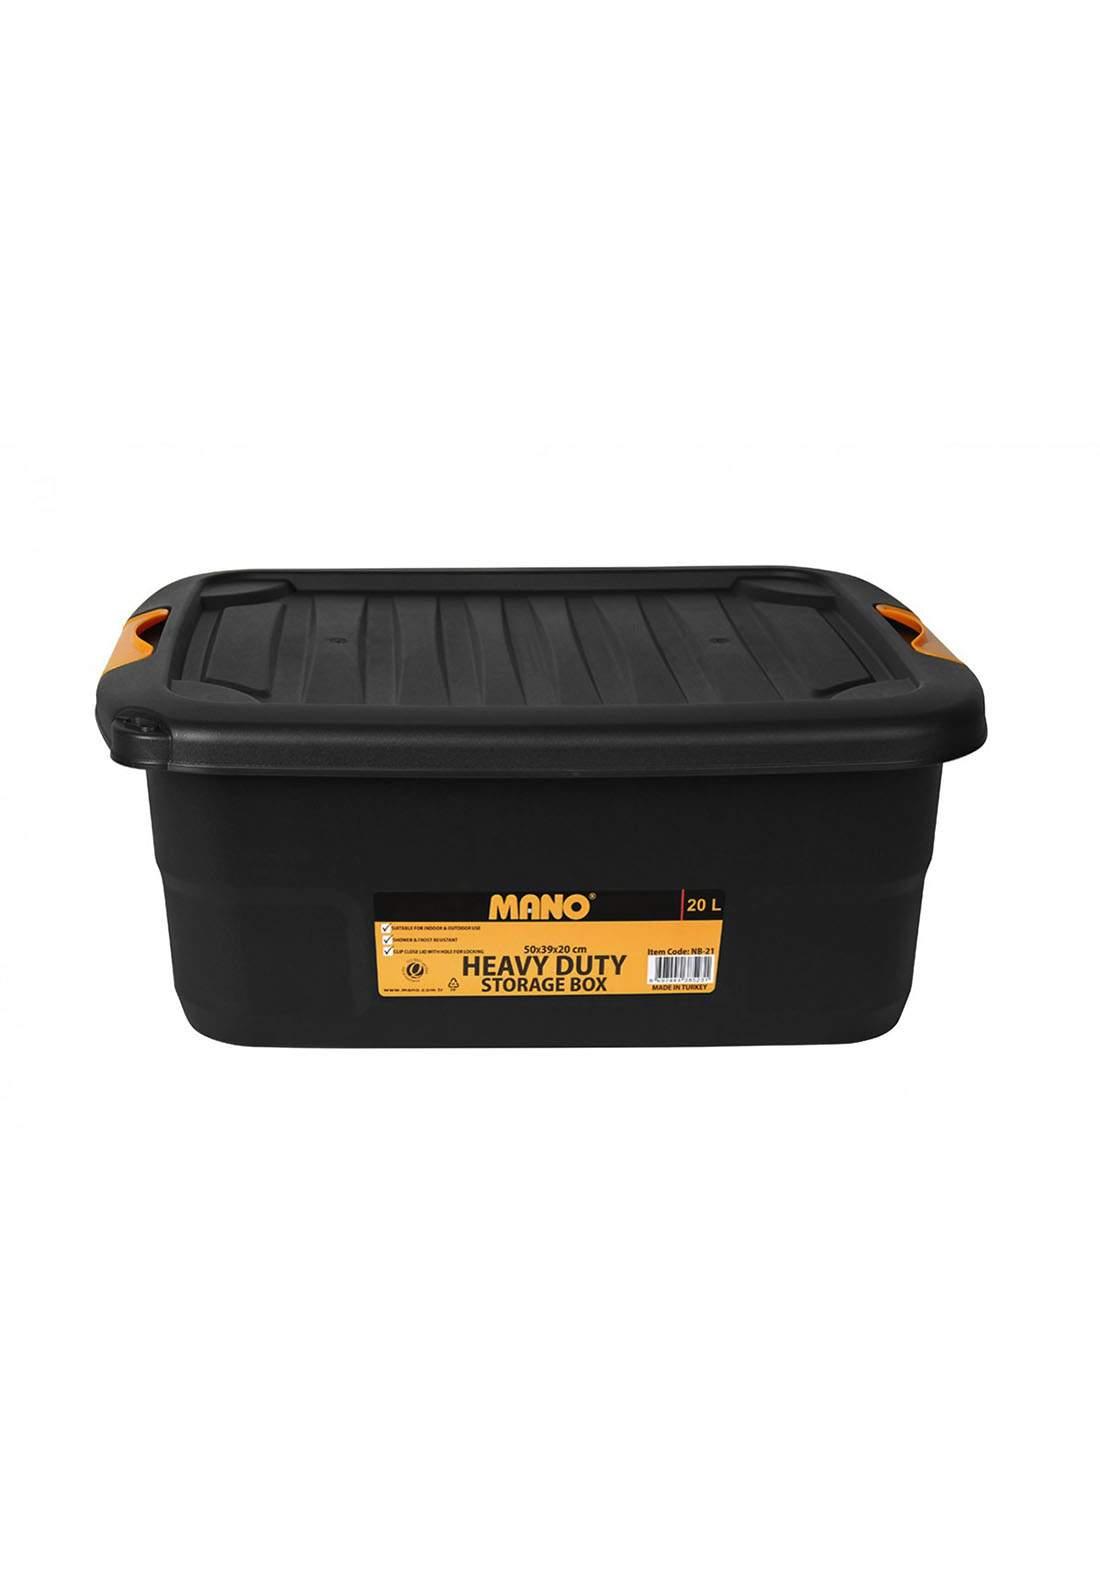 Mano NB-21 Storage Box 20L صندوق تخزين